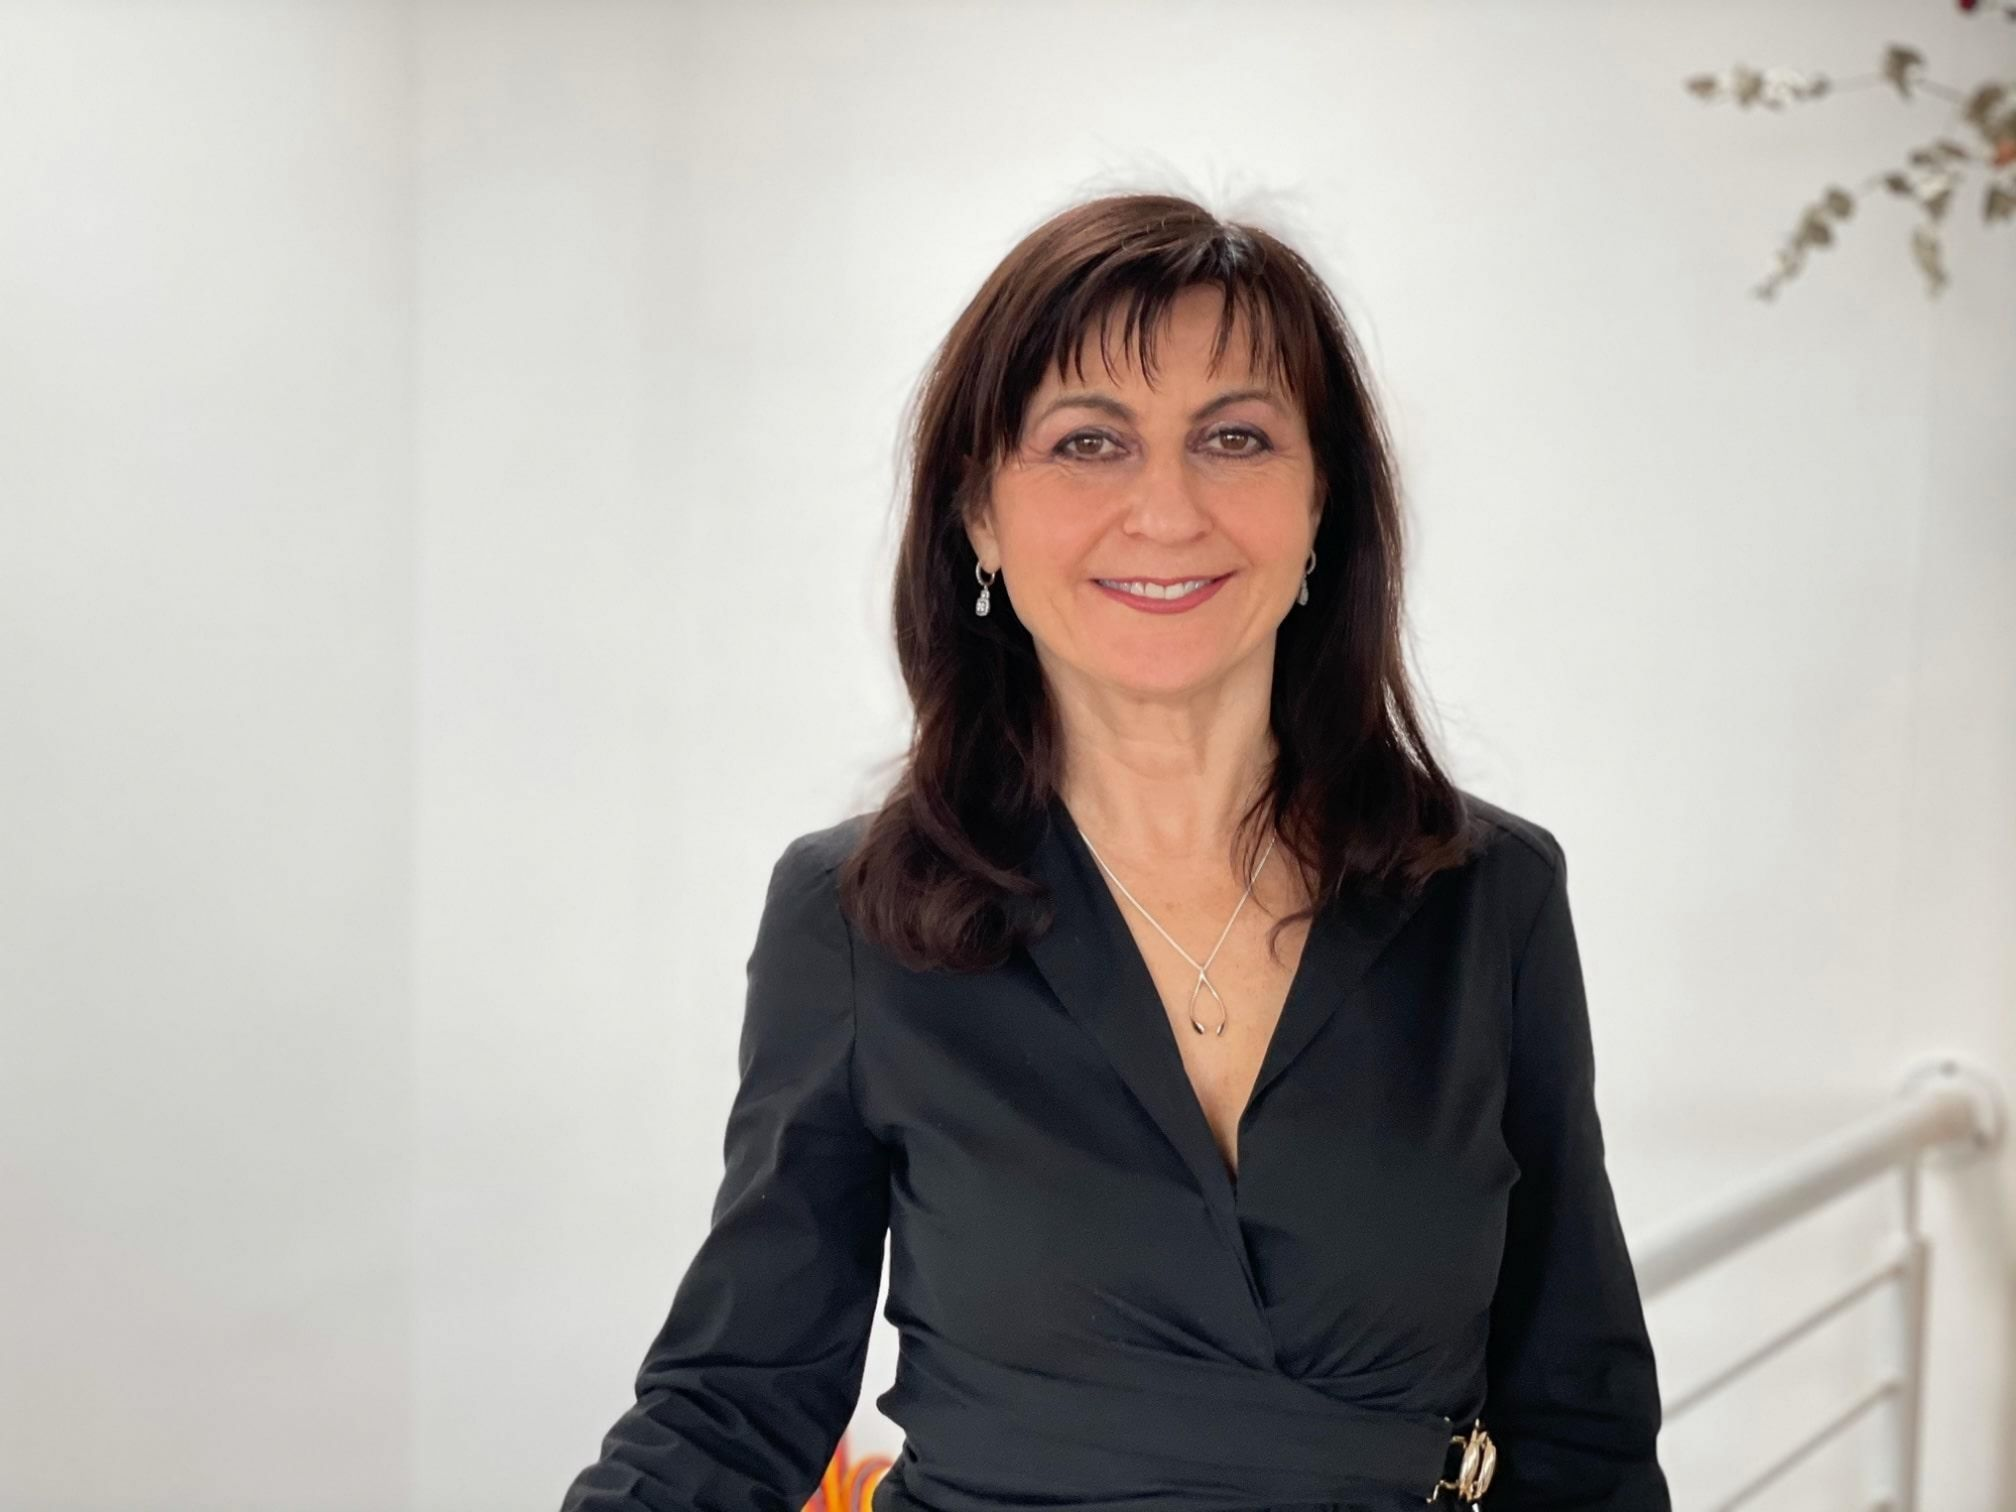 Togather Finance CEO Deborah min